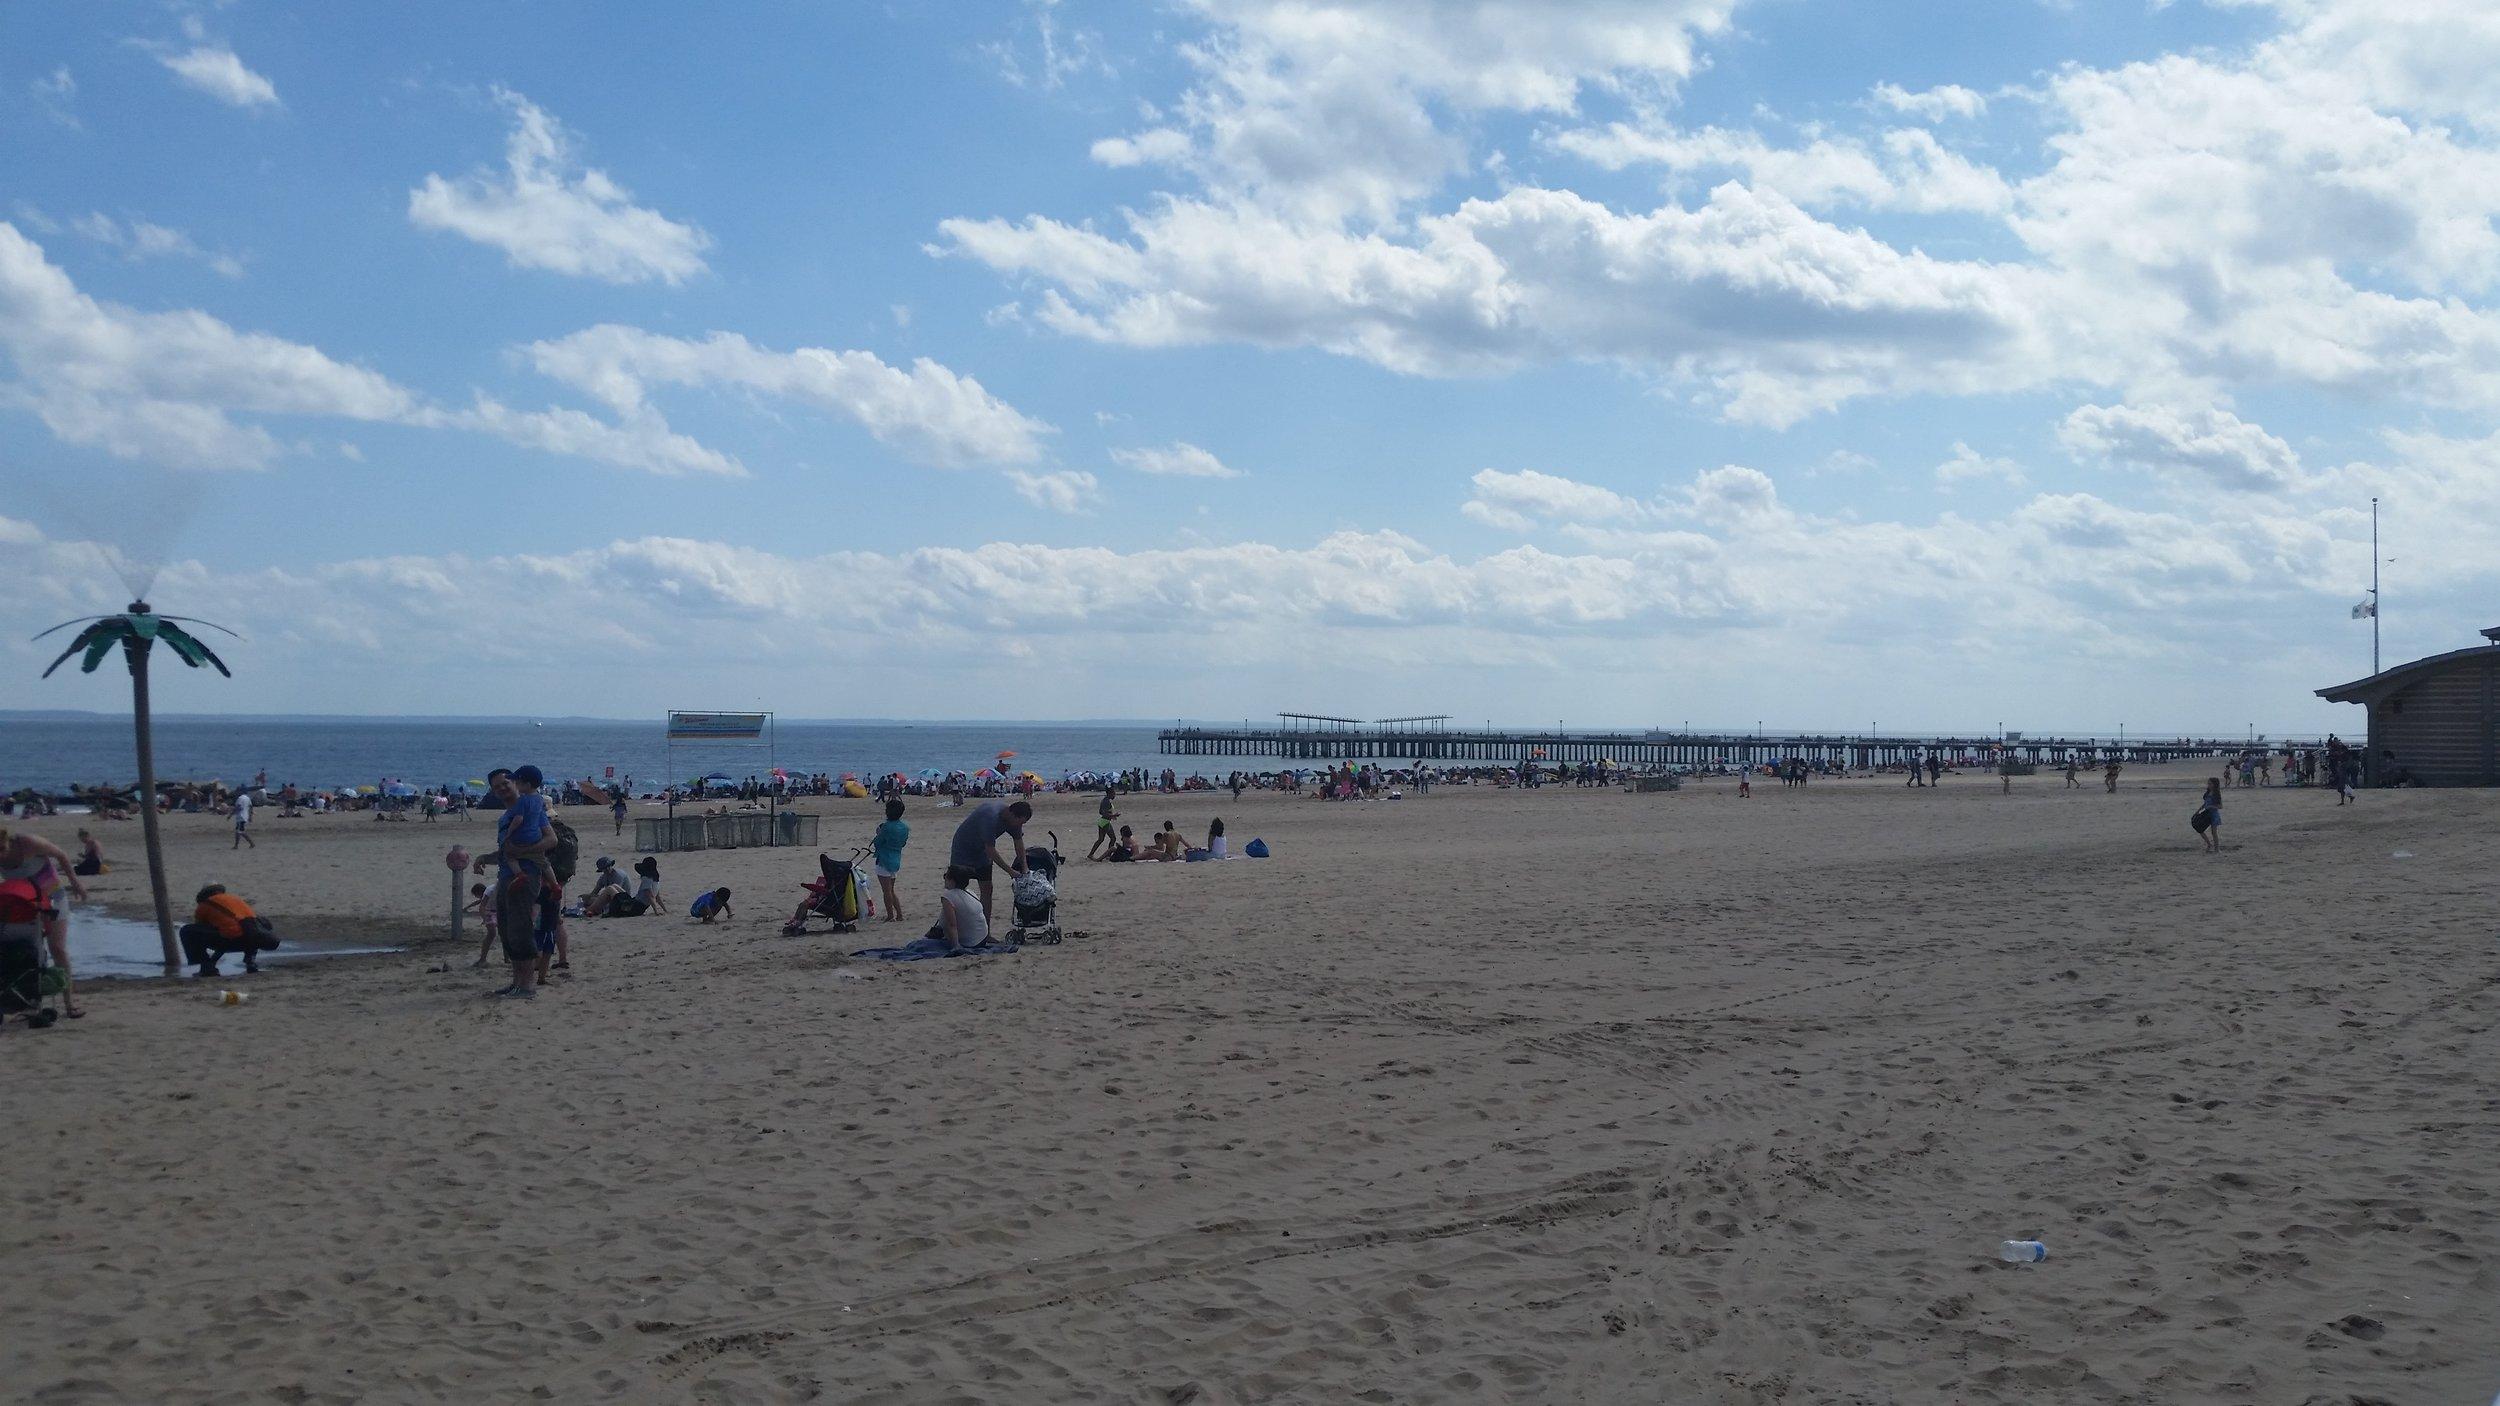 coney island6.jpg